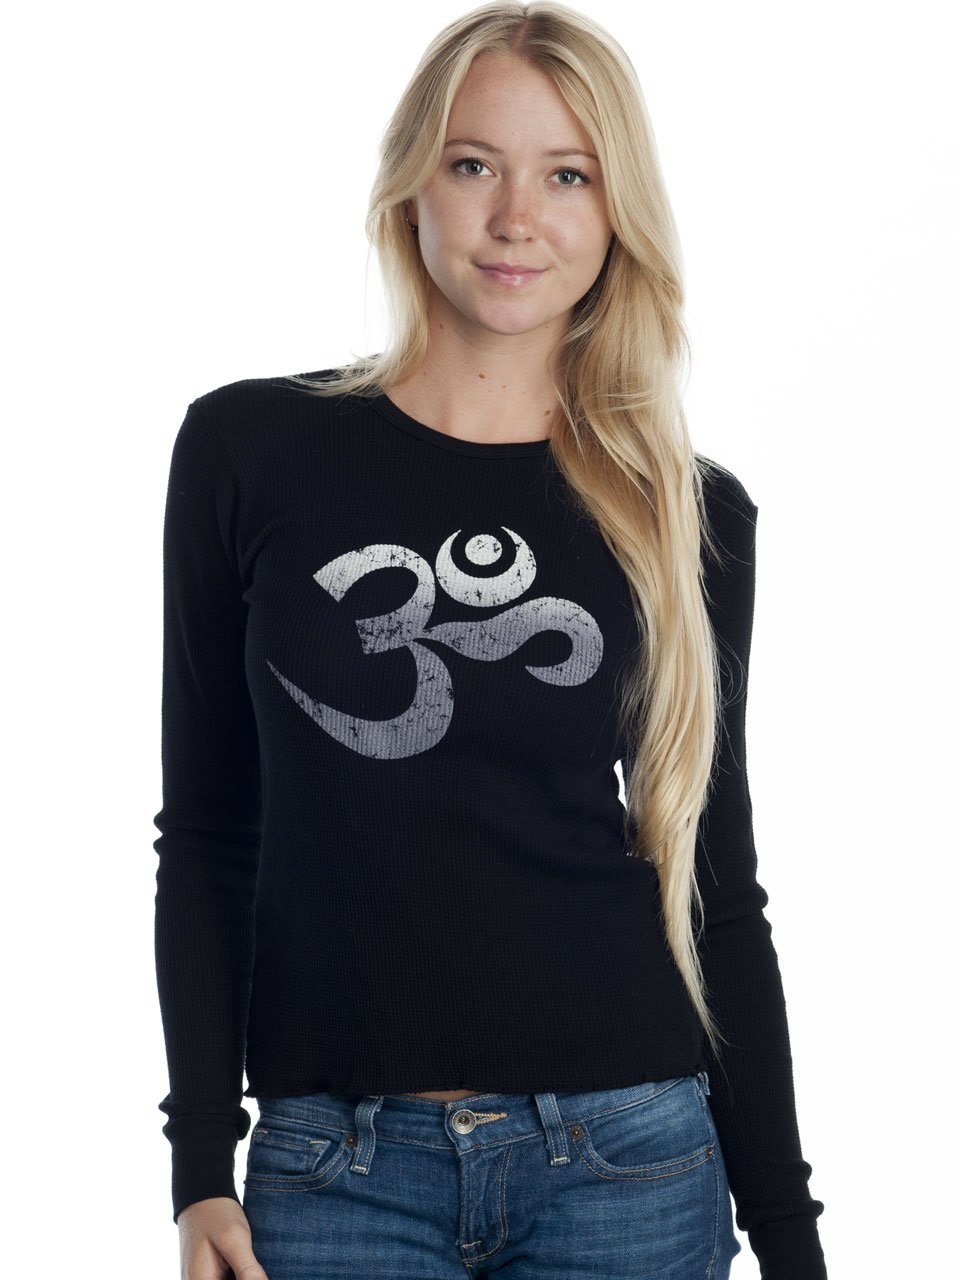 Super Buddha Women's''Om Mantra'' Long Sleeve Thermal, Black, Medium